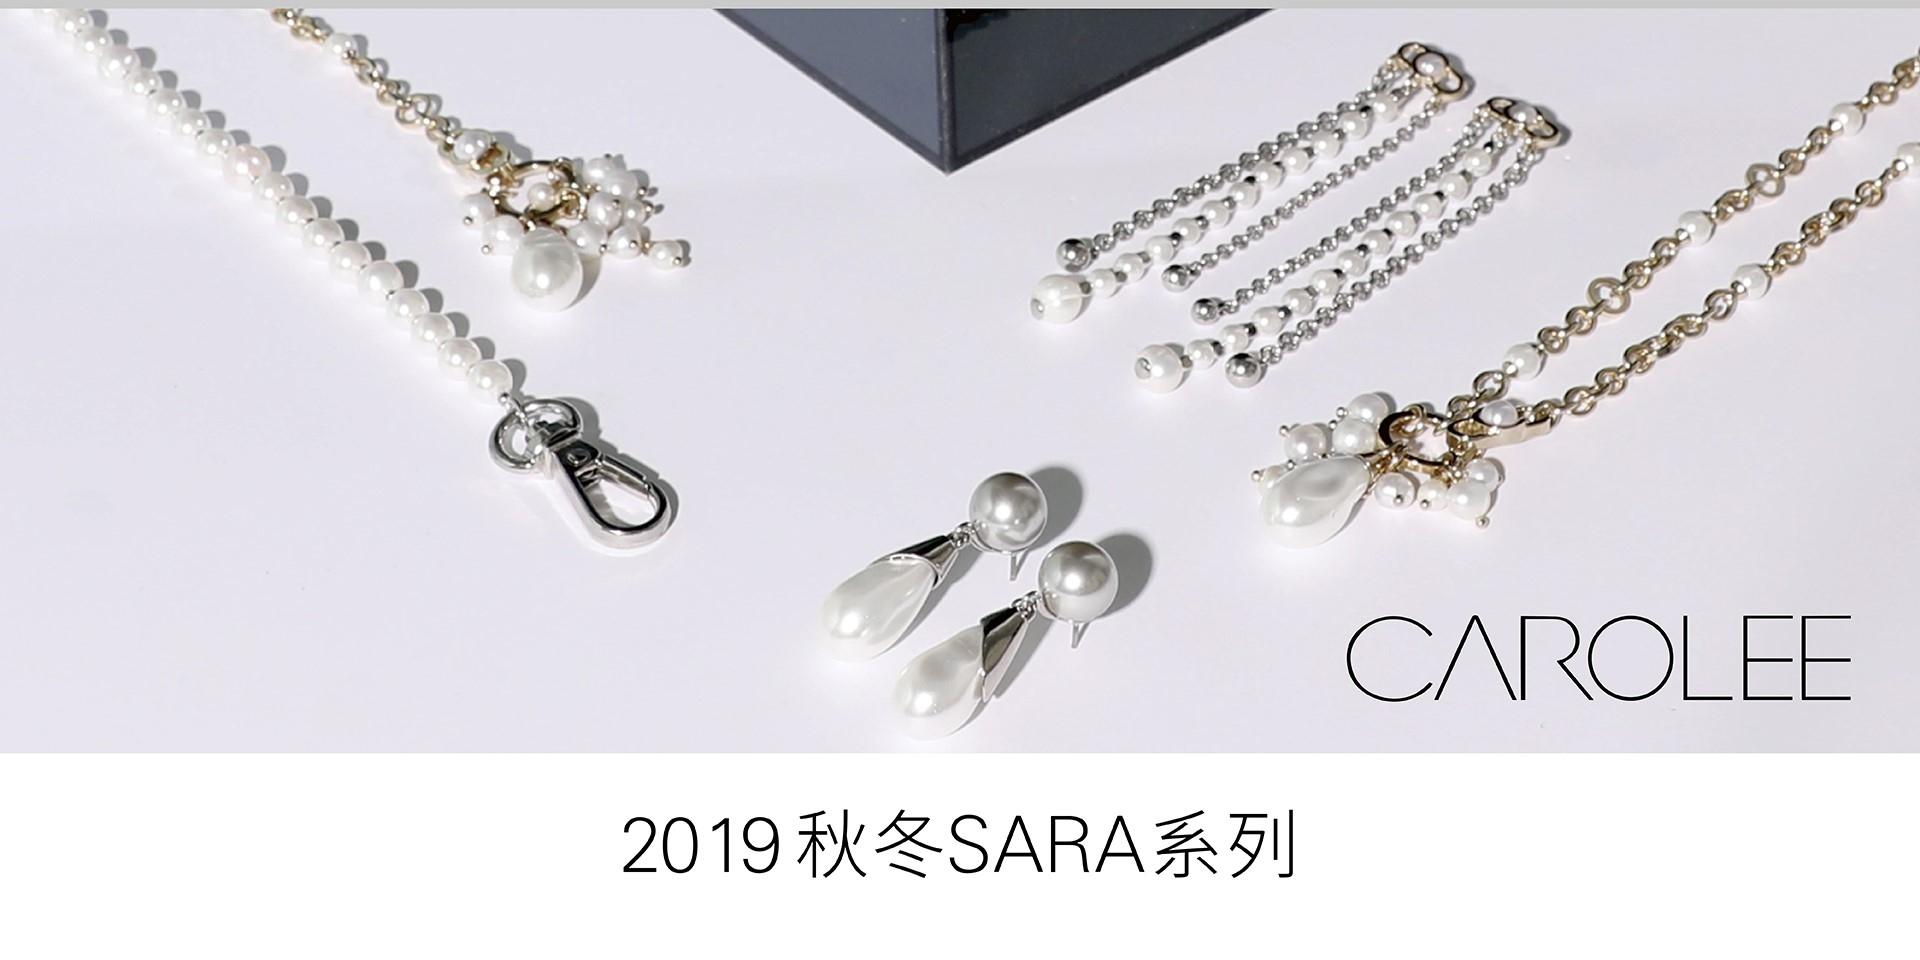 2019 carolee秋冬新品 SARA系列